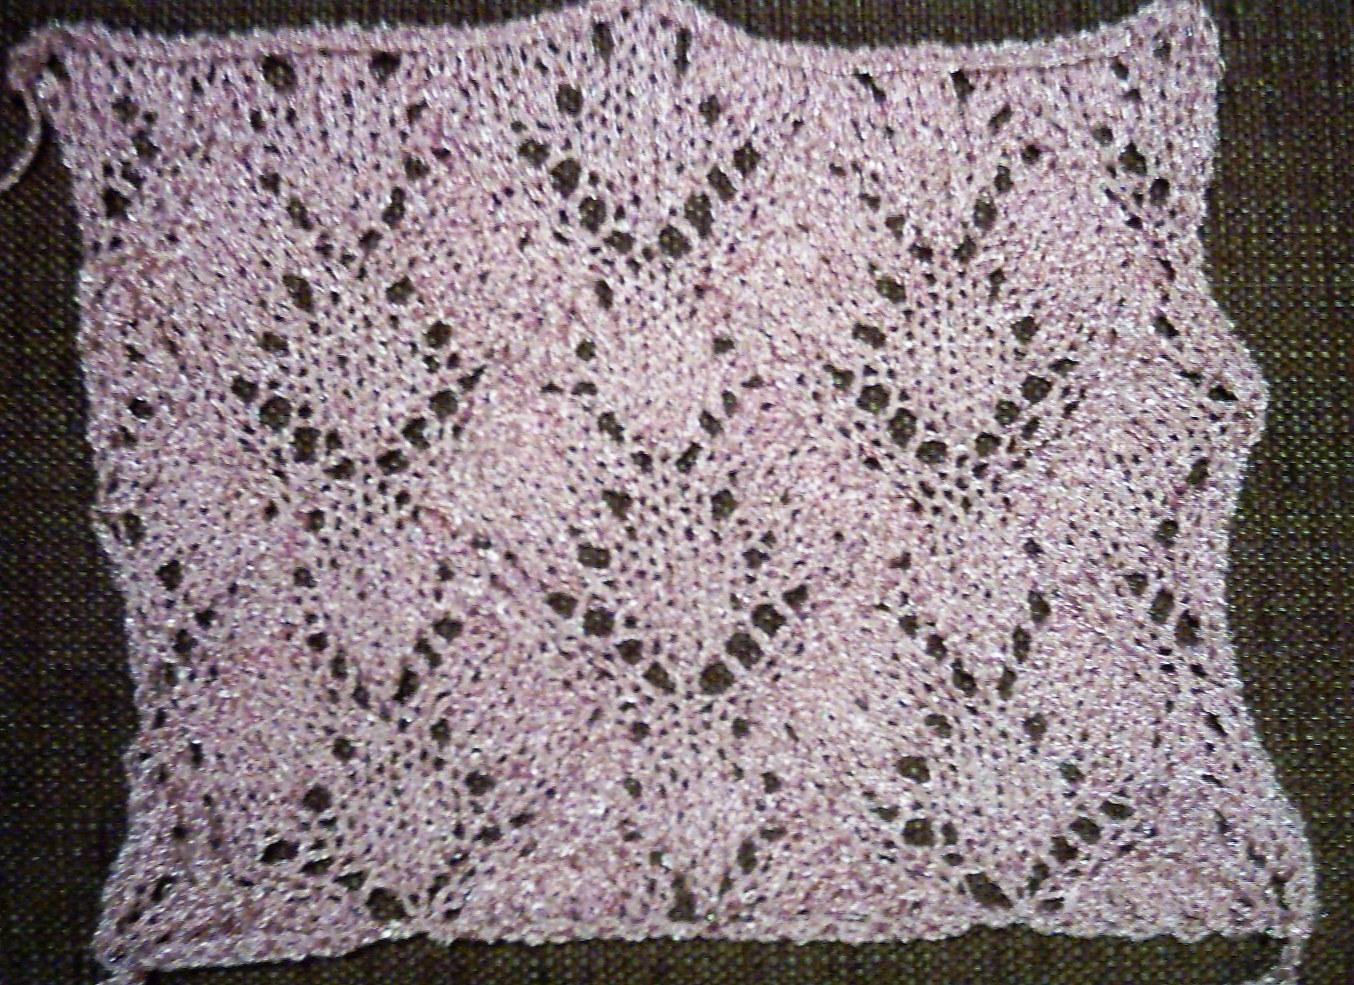 pulovere tricotate manual incepute de sus